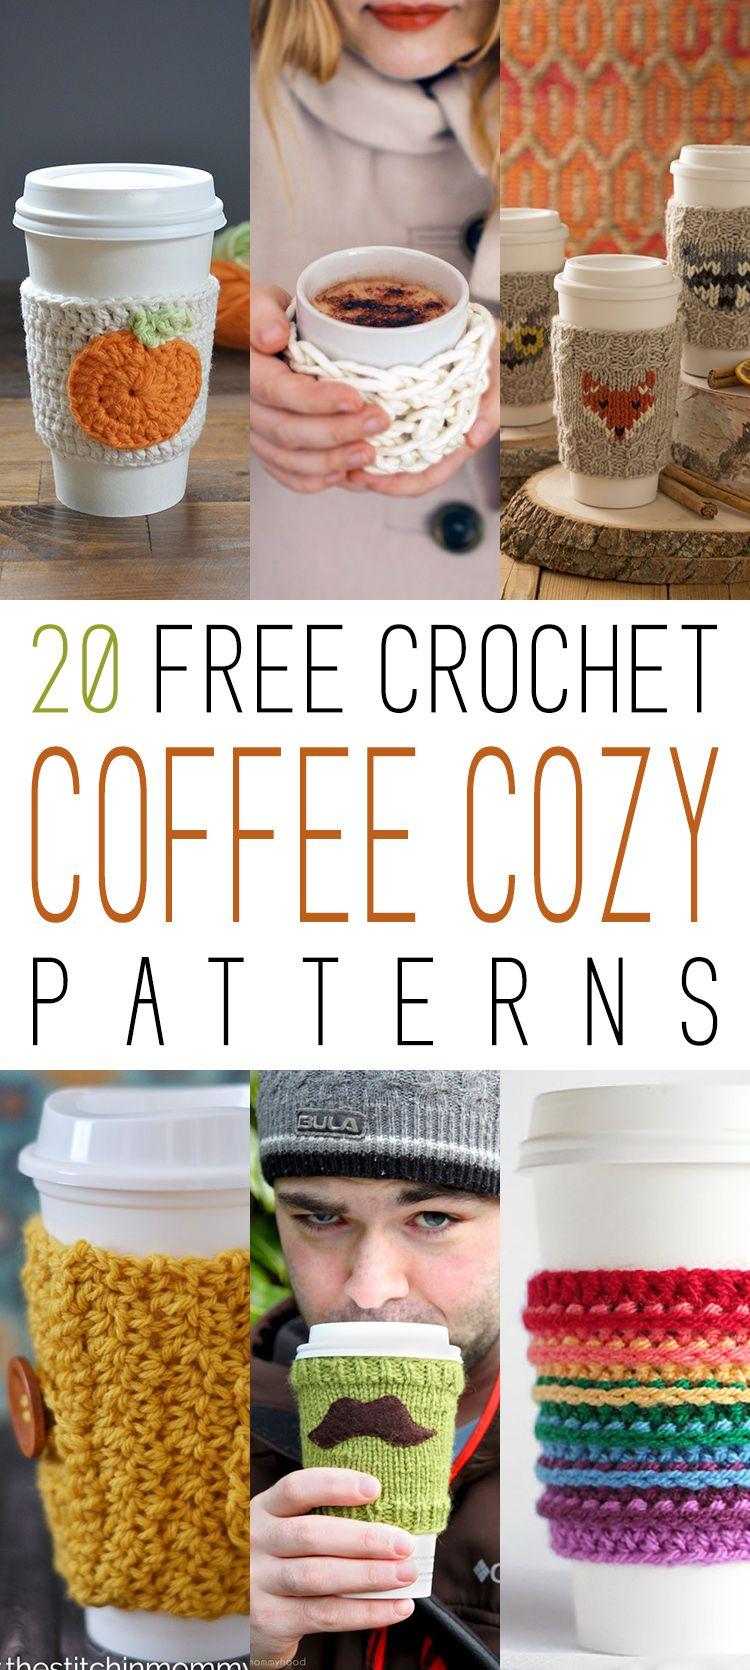 20 Free Crochet Coffee Cozy Patterns | Tejido, Portavasos y Puntadas ...